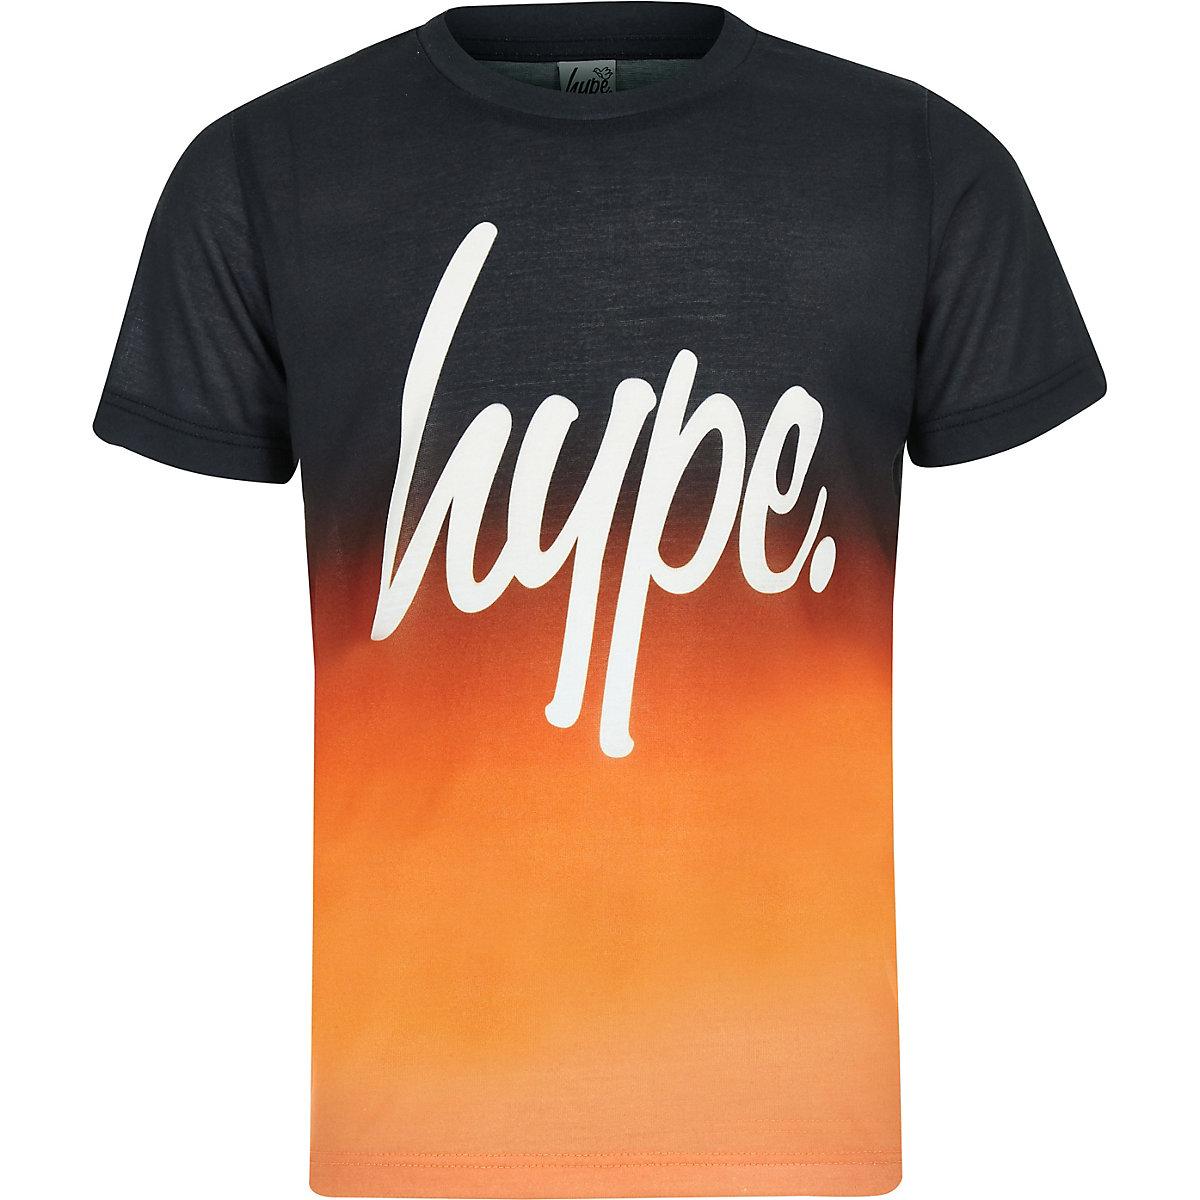 Boys Hype orange fade T-shirt